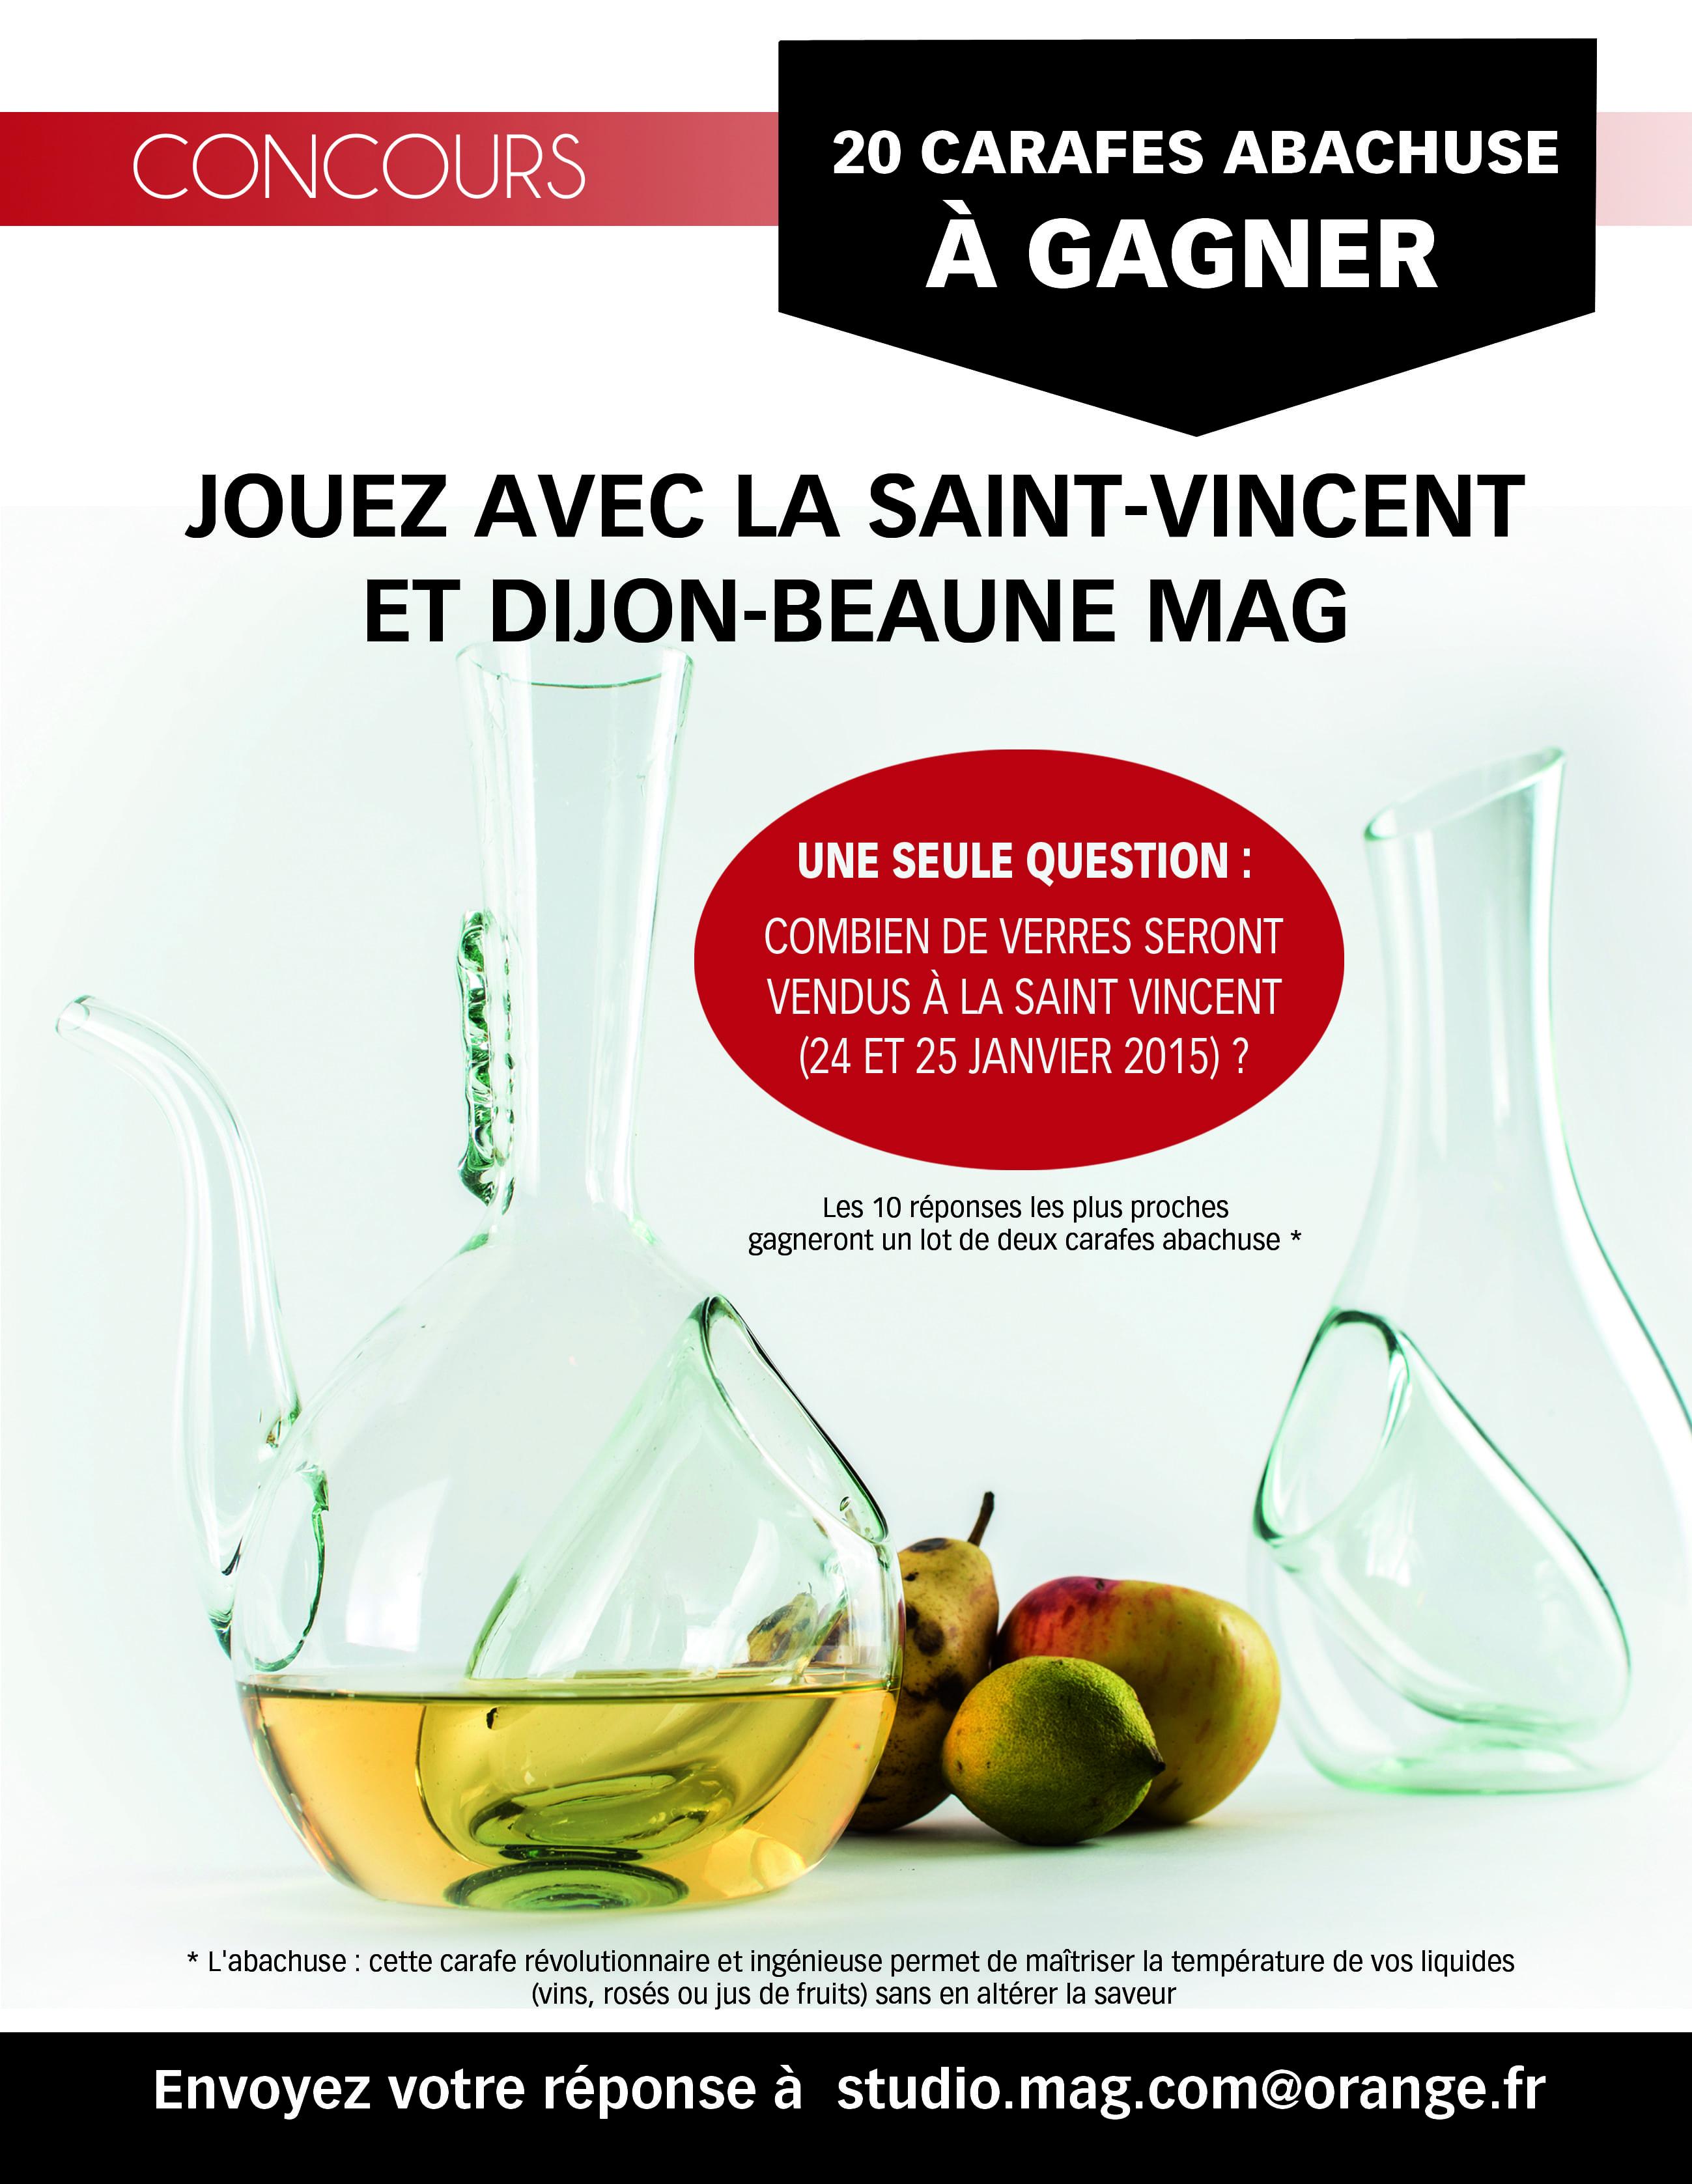 Saint-Vincent 2015: des carafes à gagner